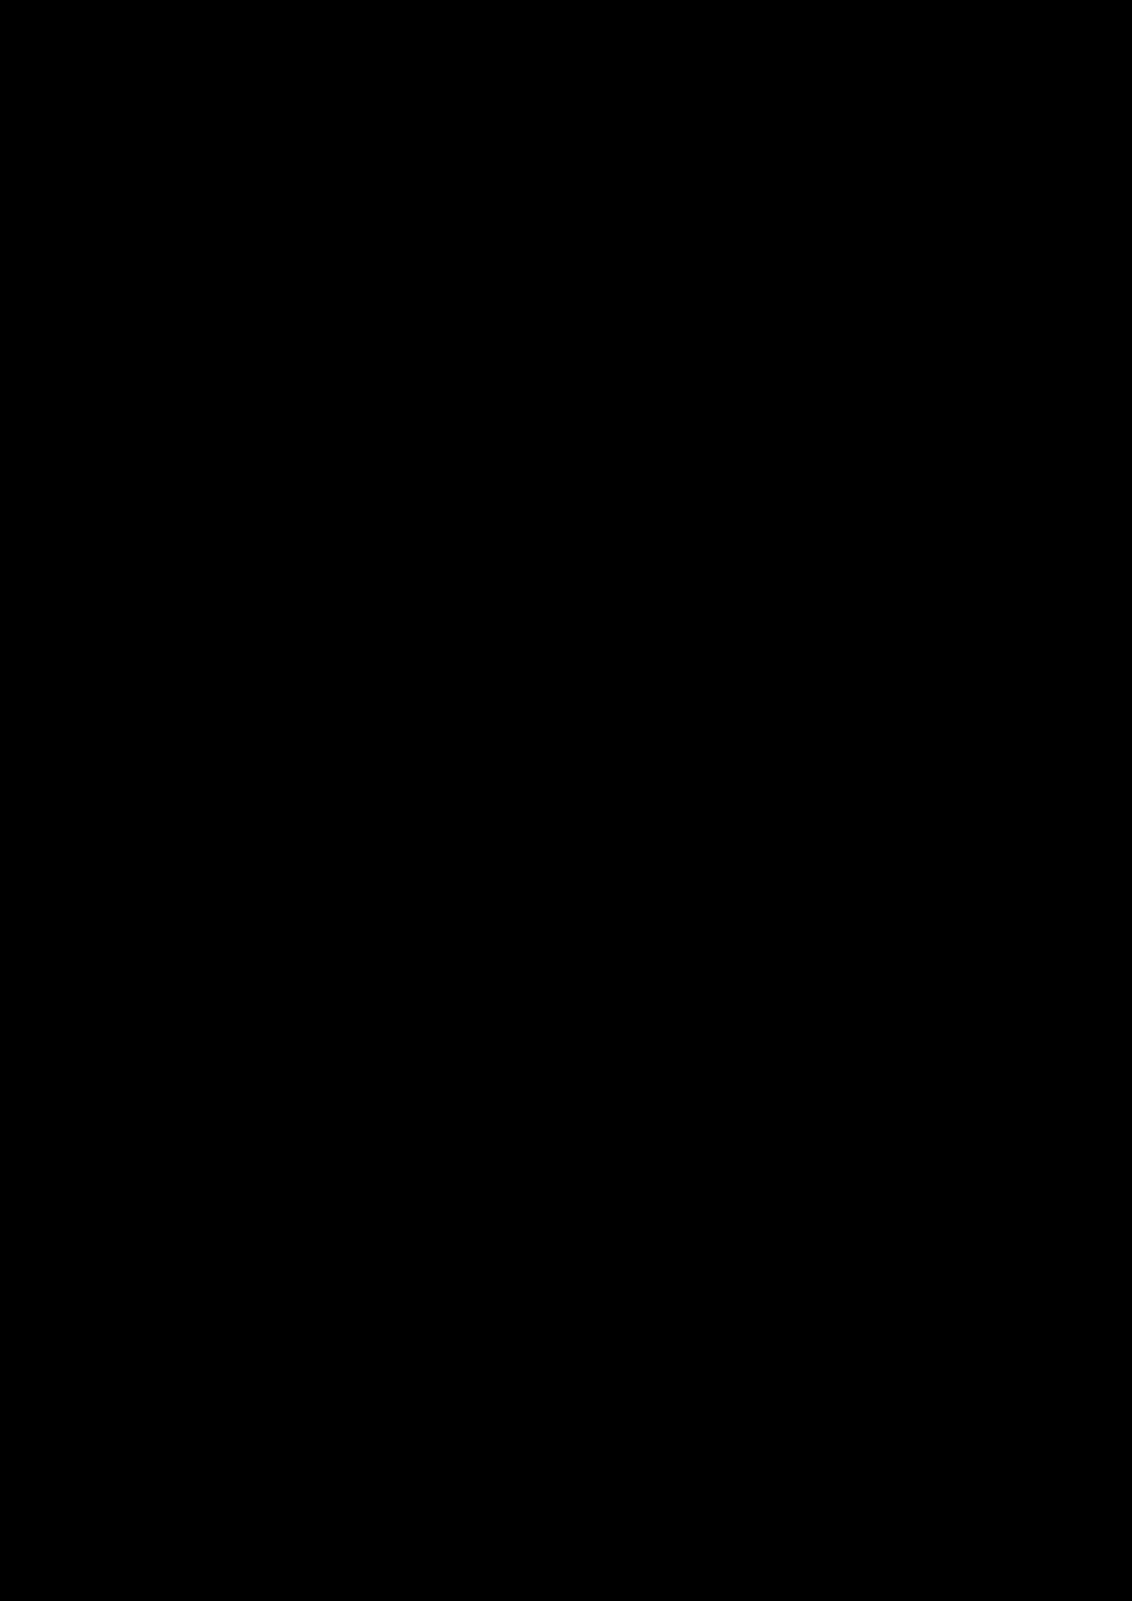 Ot Bolshogo Uma slide, Image 12